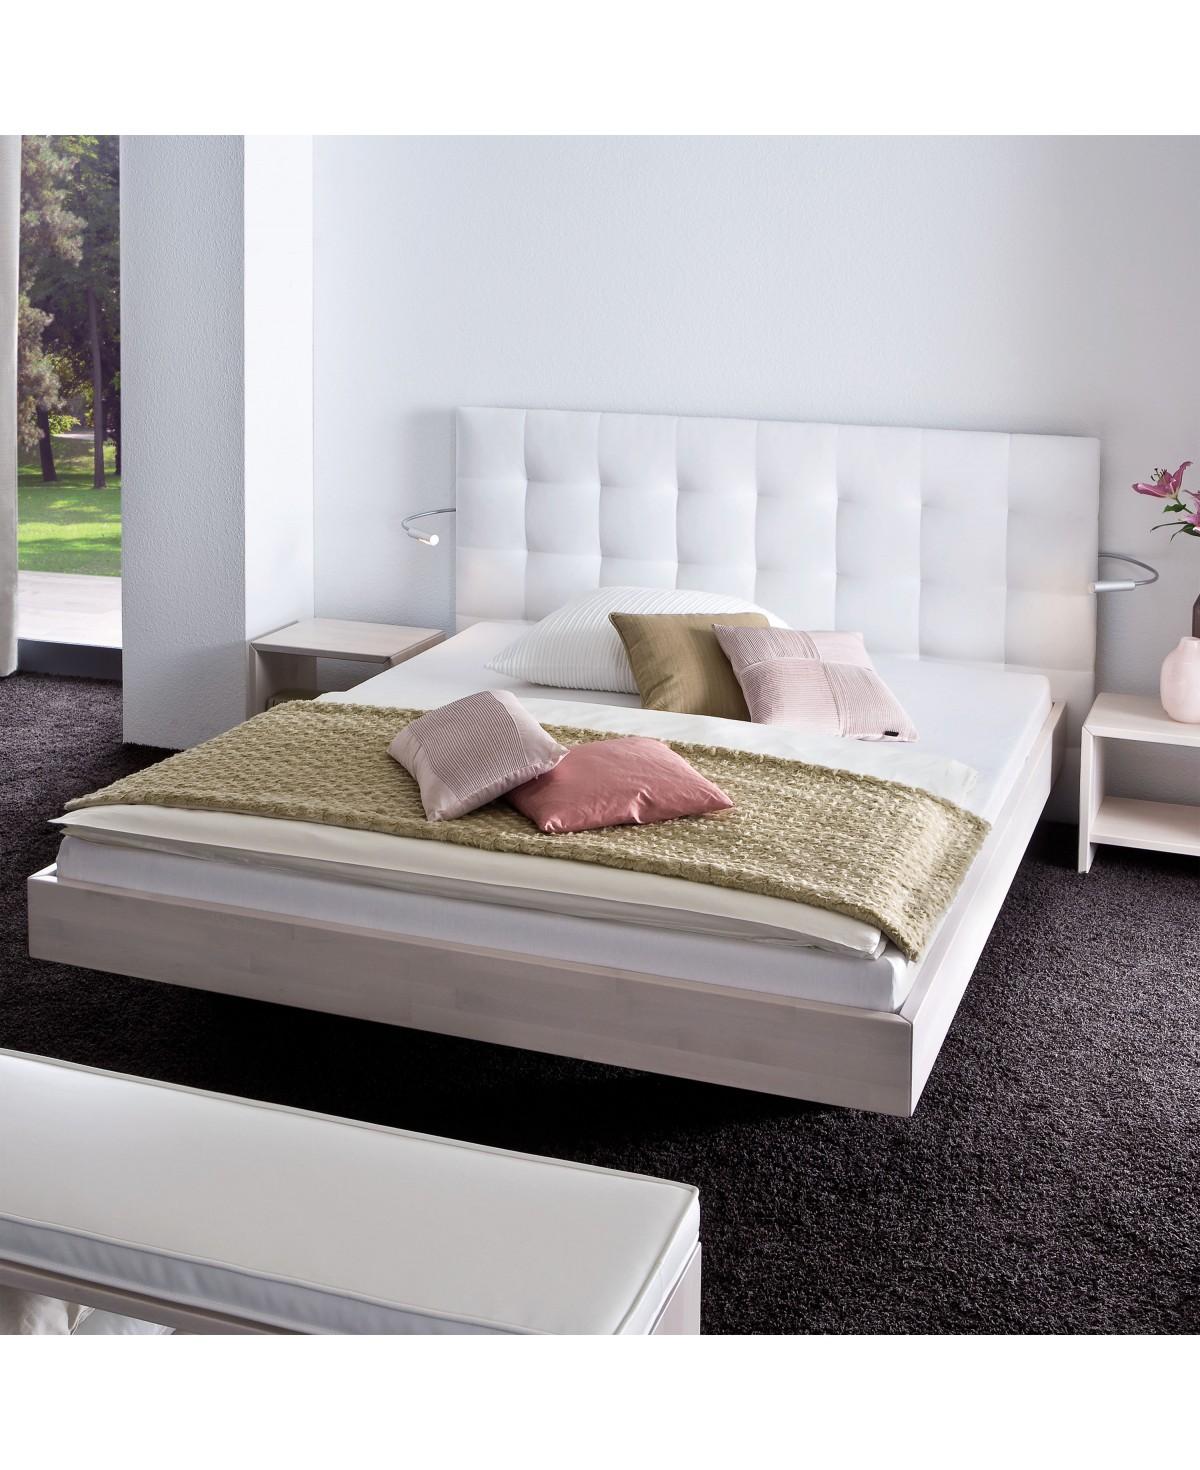 Full Size of Komplettbett 180x220 Hasena Wood Line Bett Wandpaneel Sogno L Fe Vilo Buche Wei Wohnzimmer Komplettbett 180x220